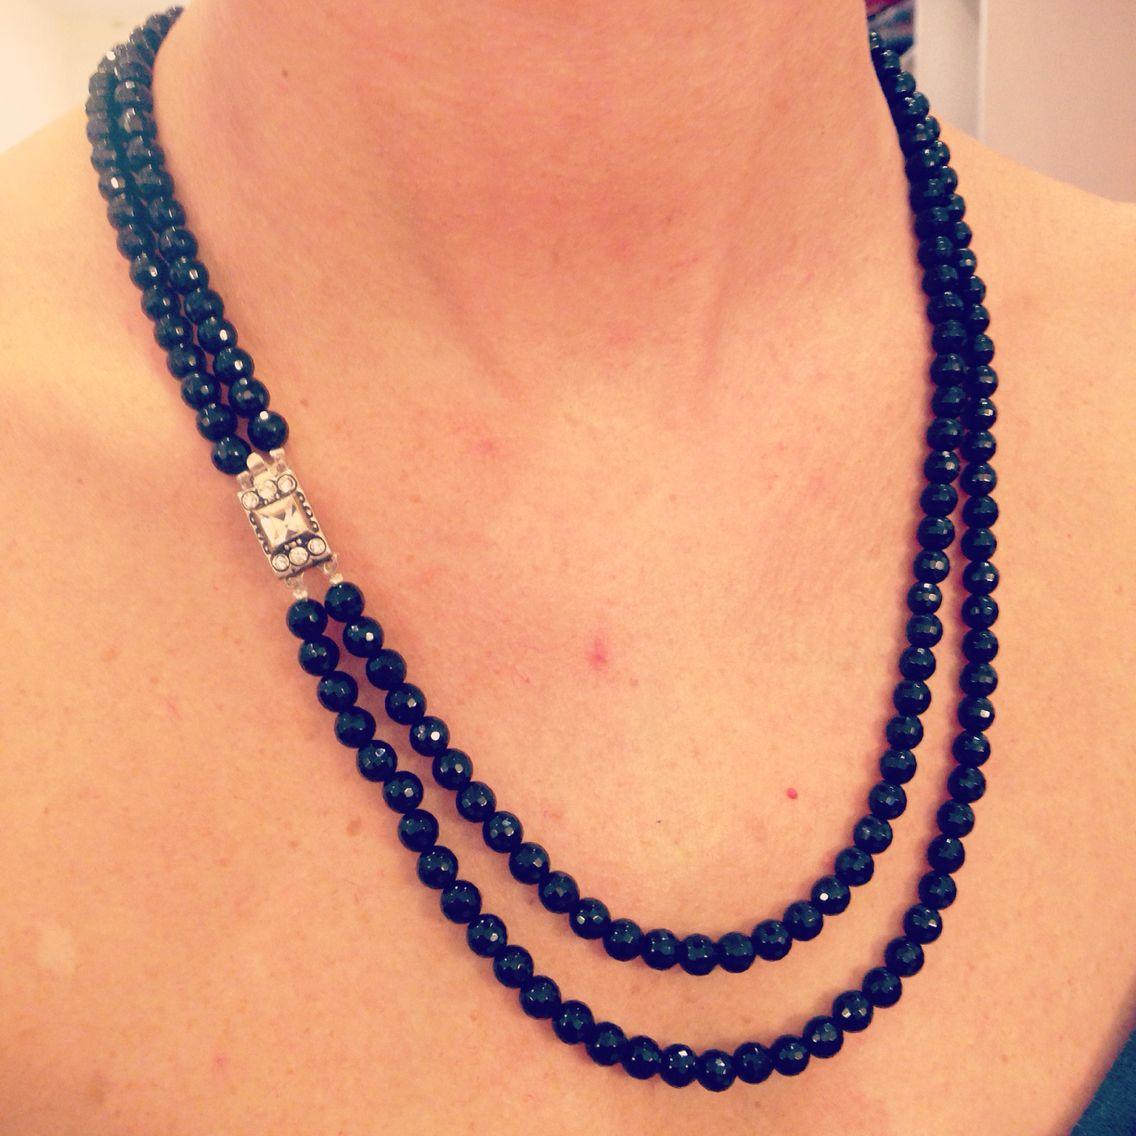 Liza korn's necklace contact@liza-korn.com